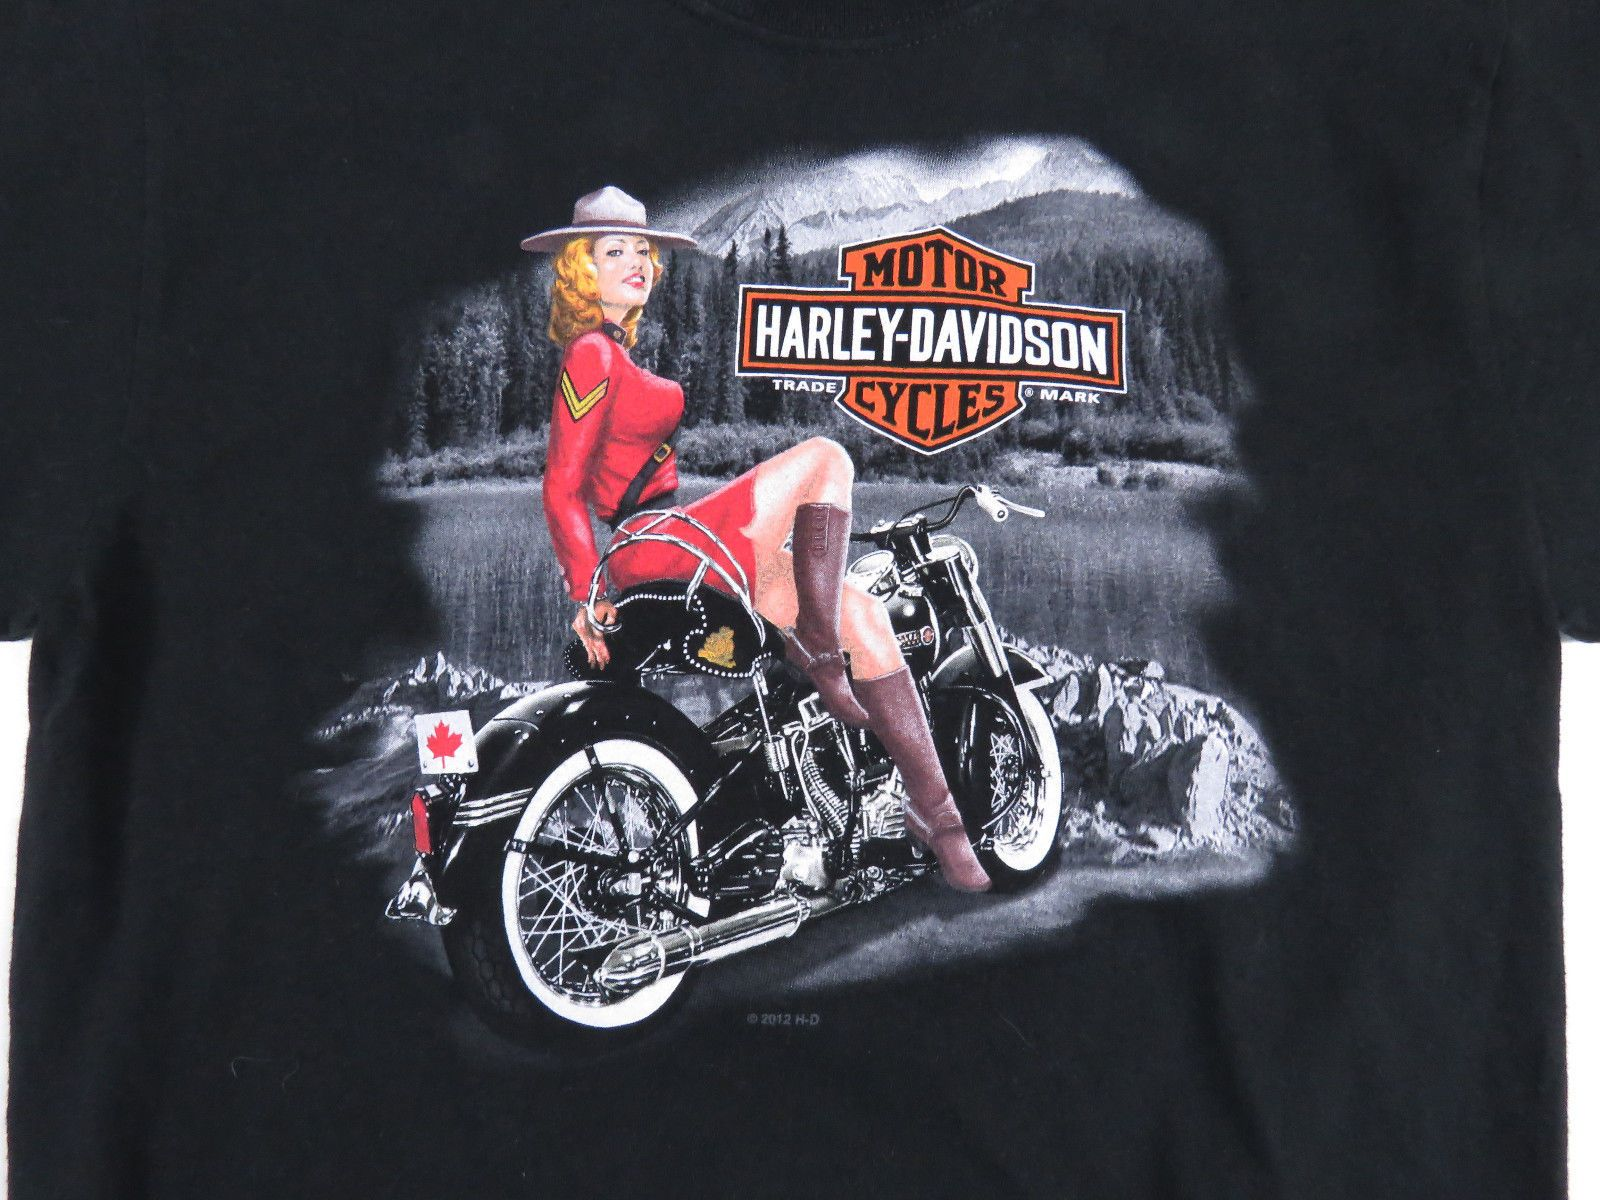 Harley Davidson Motorcycles Canada Double Sided Short Sleeve T Shirt Biker S Harley Davidson Motorcycles Harley Harley Davidson Shirt